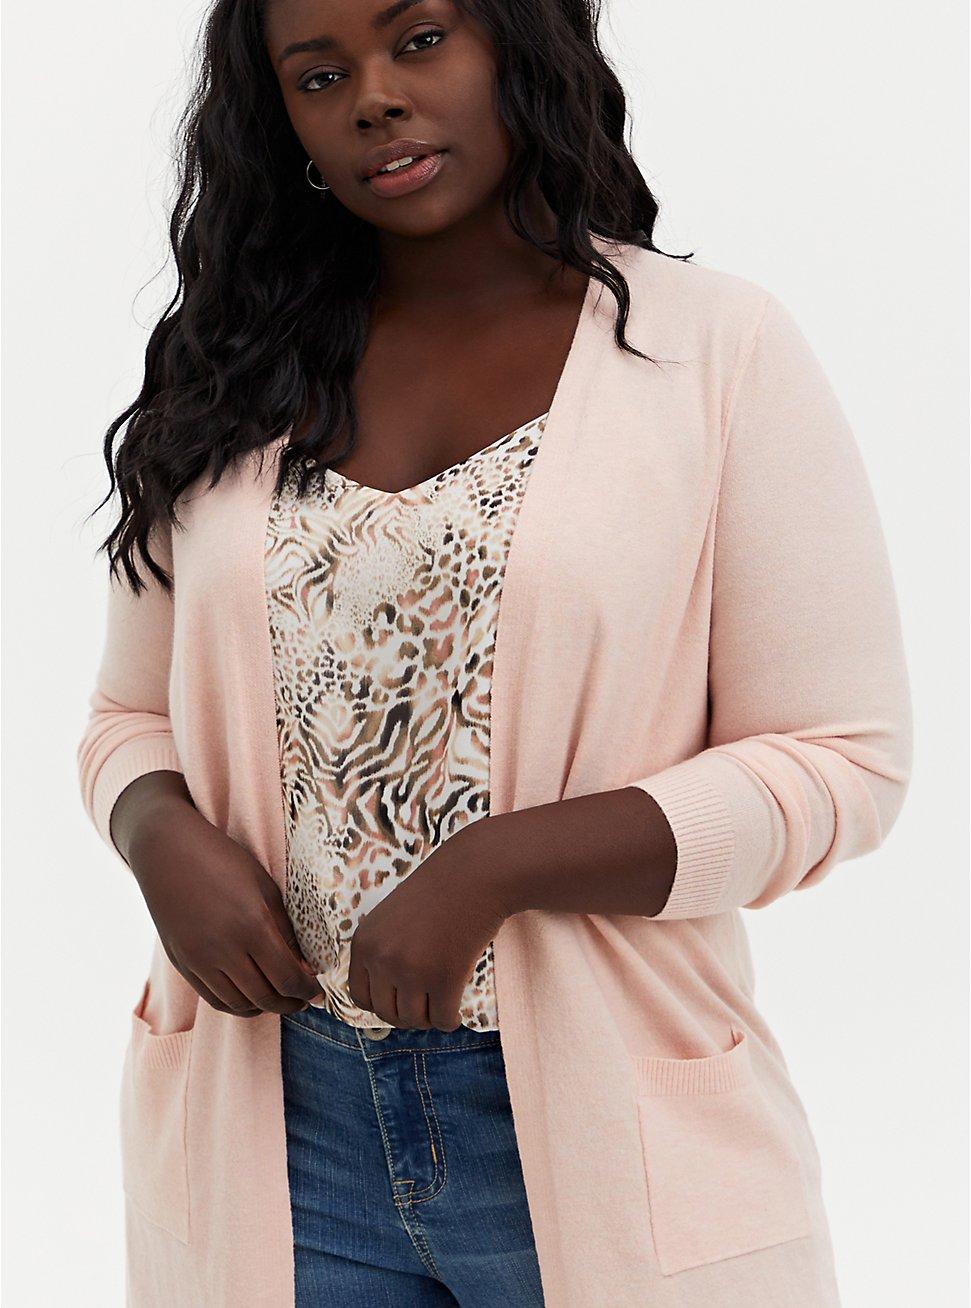 Light Pink Soft Yarn Duster Cardigan, PALE BLUSH, hi-res